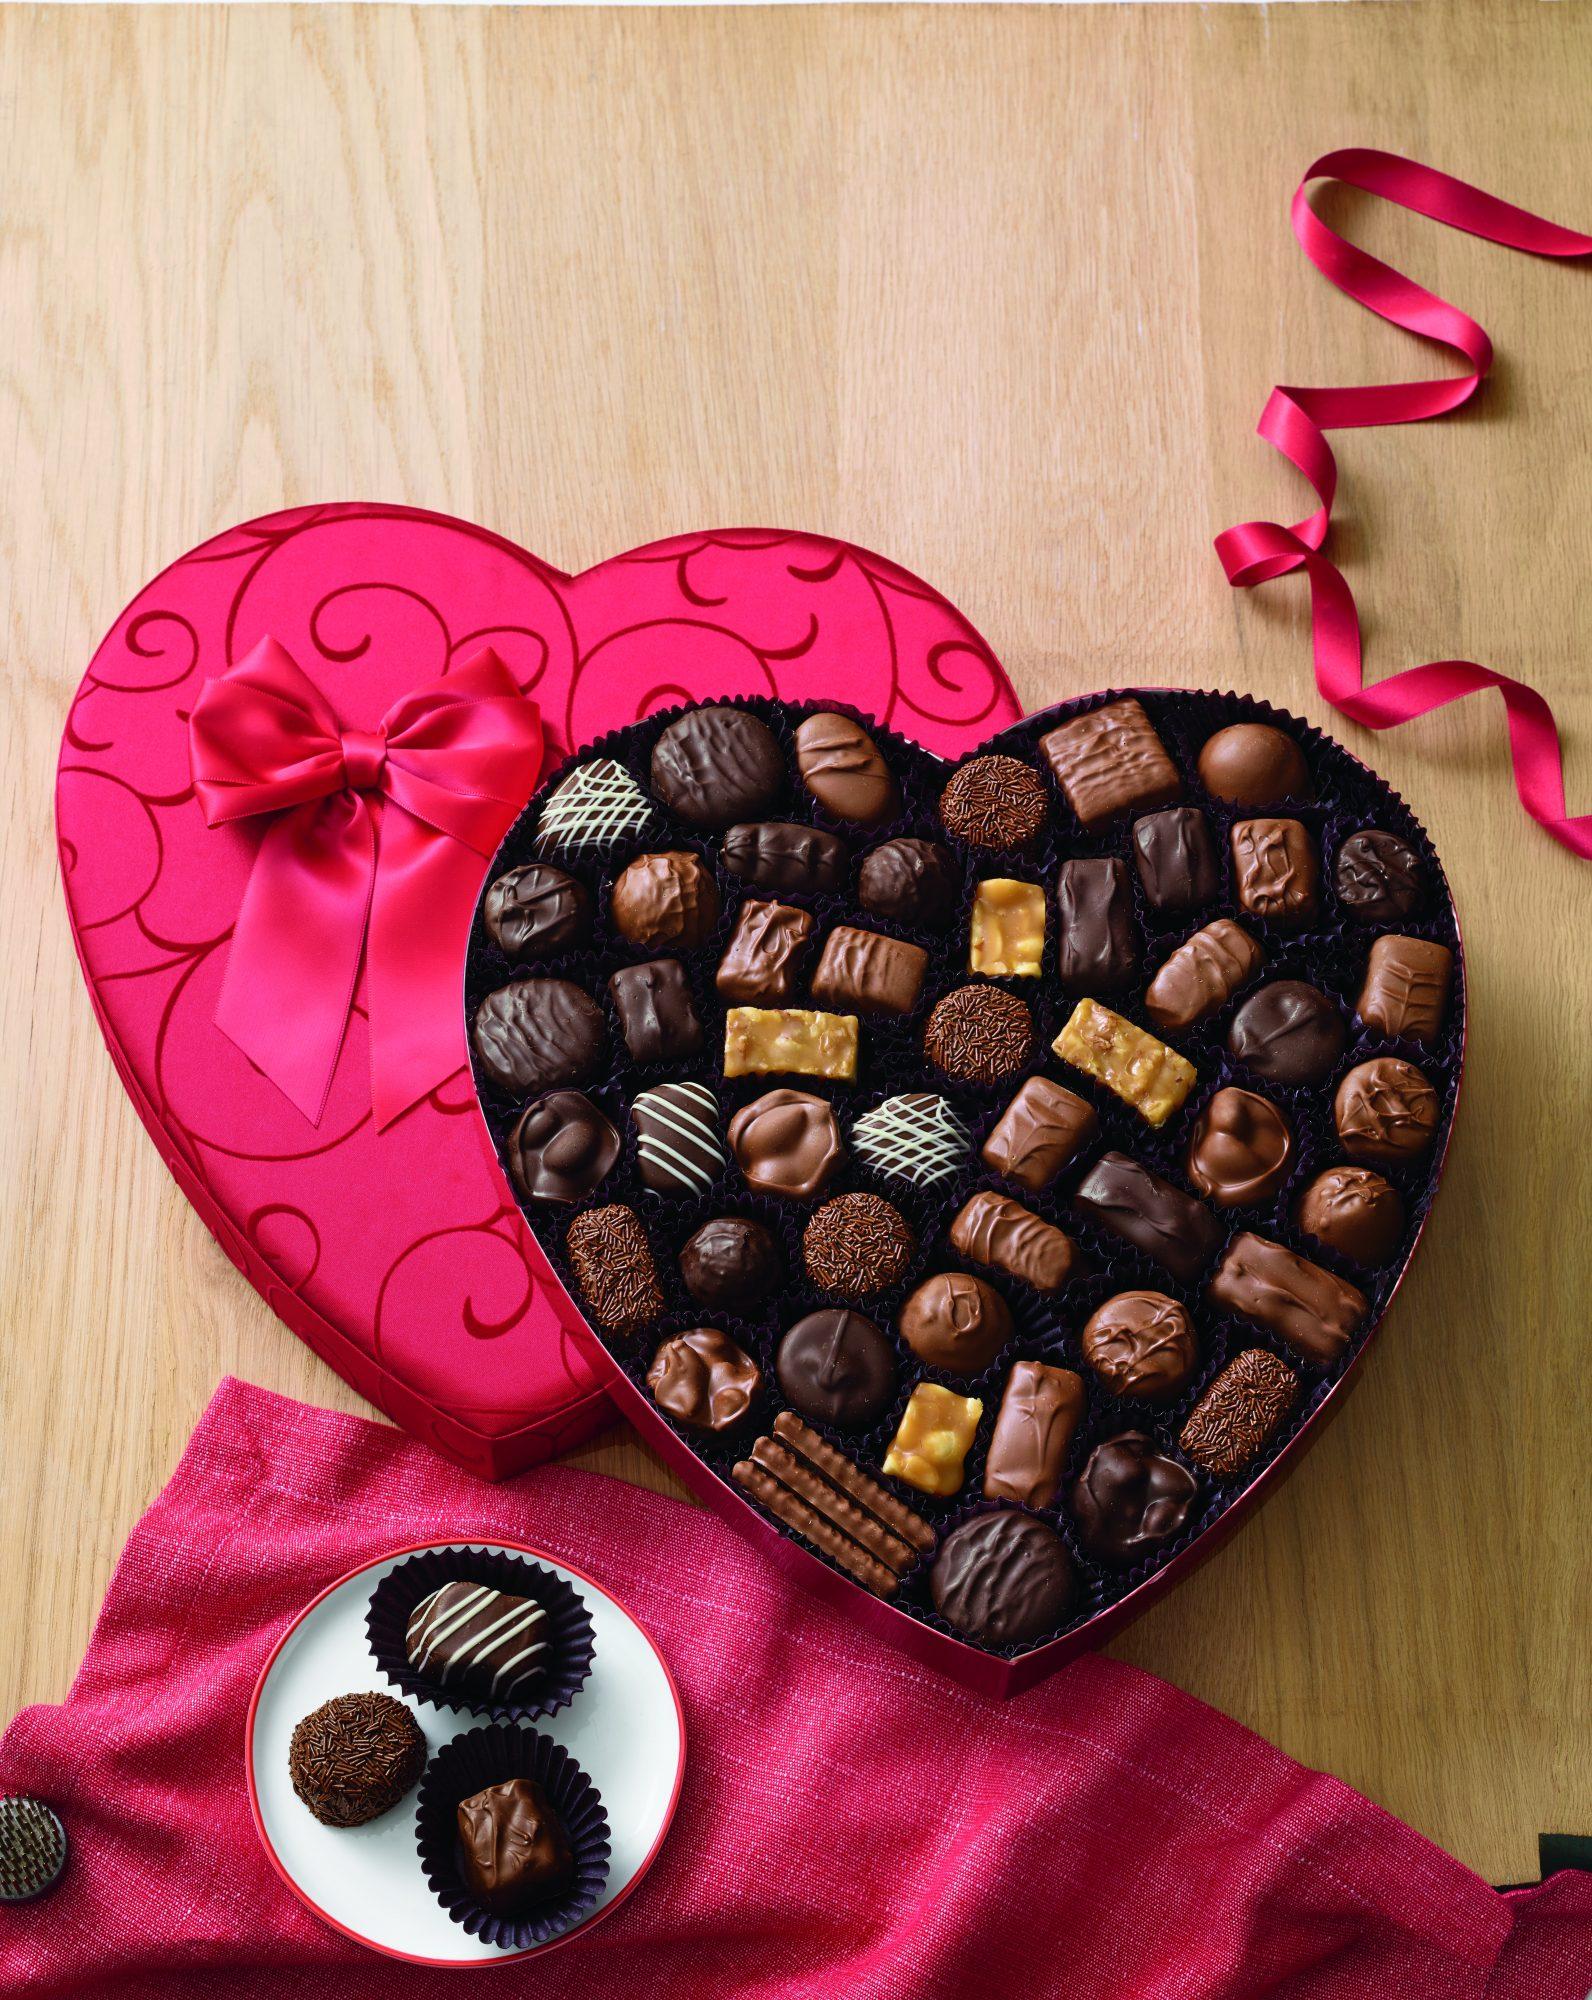 sweet-indulgence-heart-light-wood-surface-copy.jpg